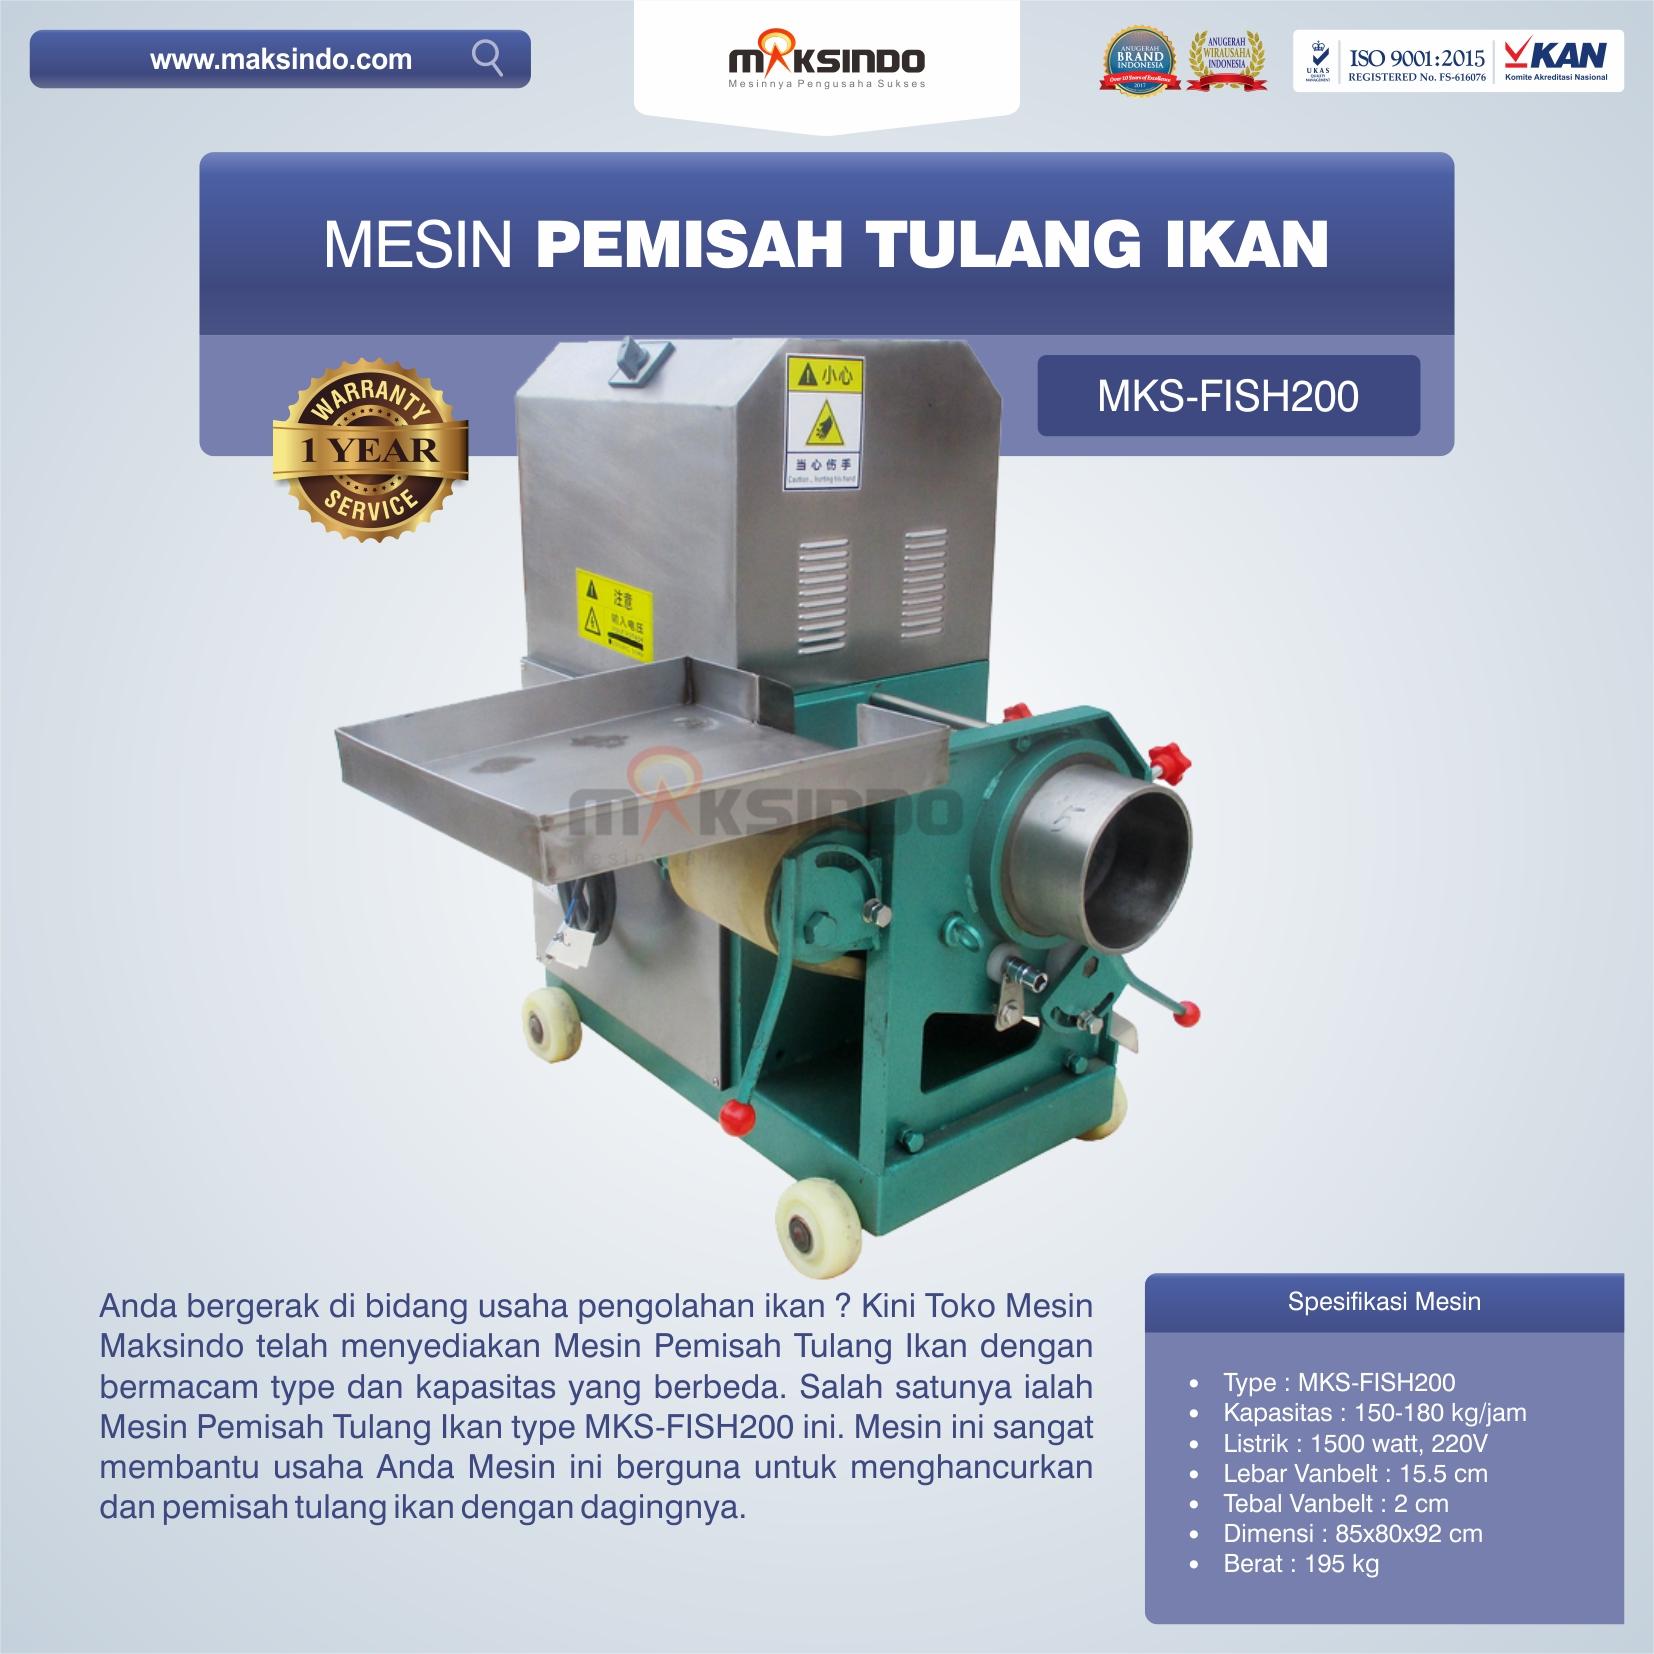 Jual Mesin Pemisah Tulang Ikan MKS-FISH200 Di Bekasi